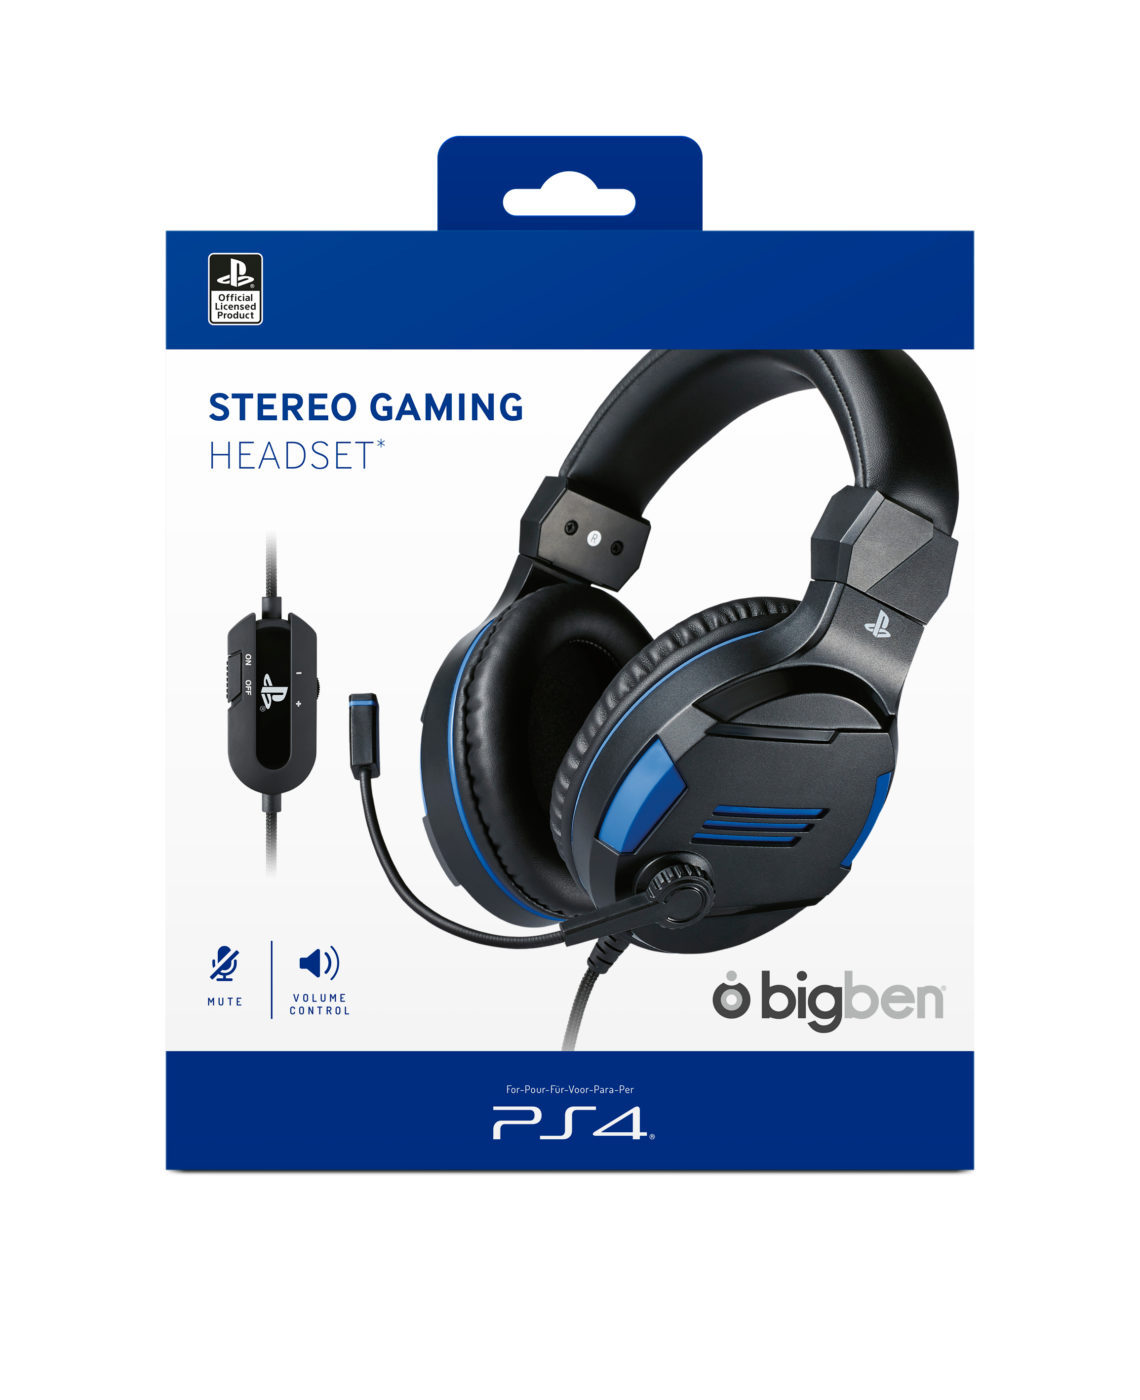 Strereo gaming headset for PS4™, PC, MAC and mobile devices - Image  #2tutu#4tutu#6tutu#7